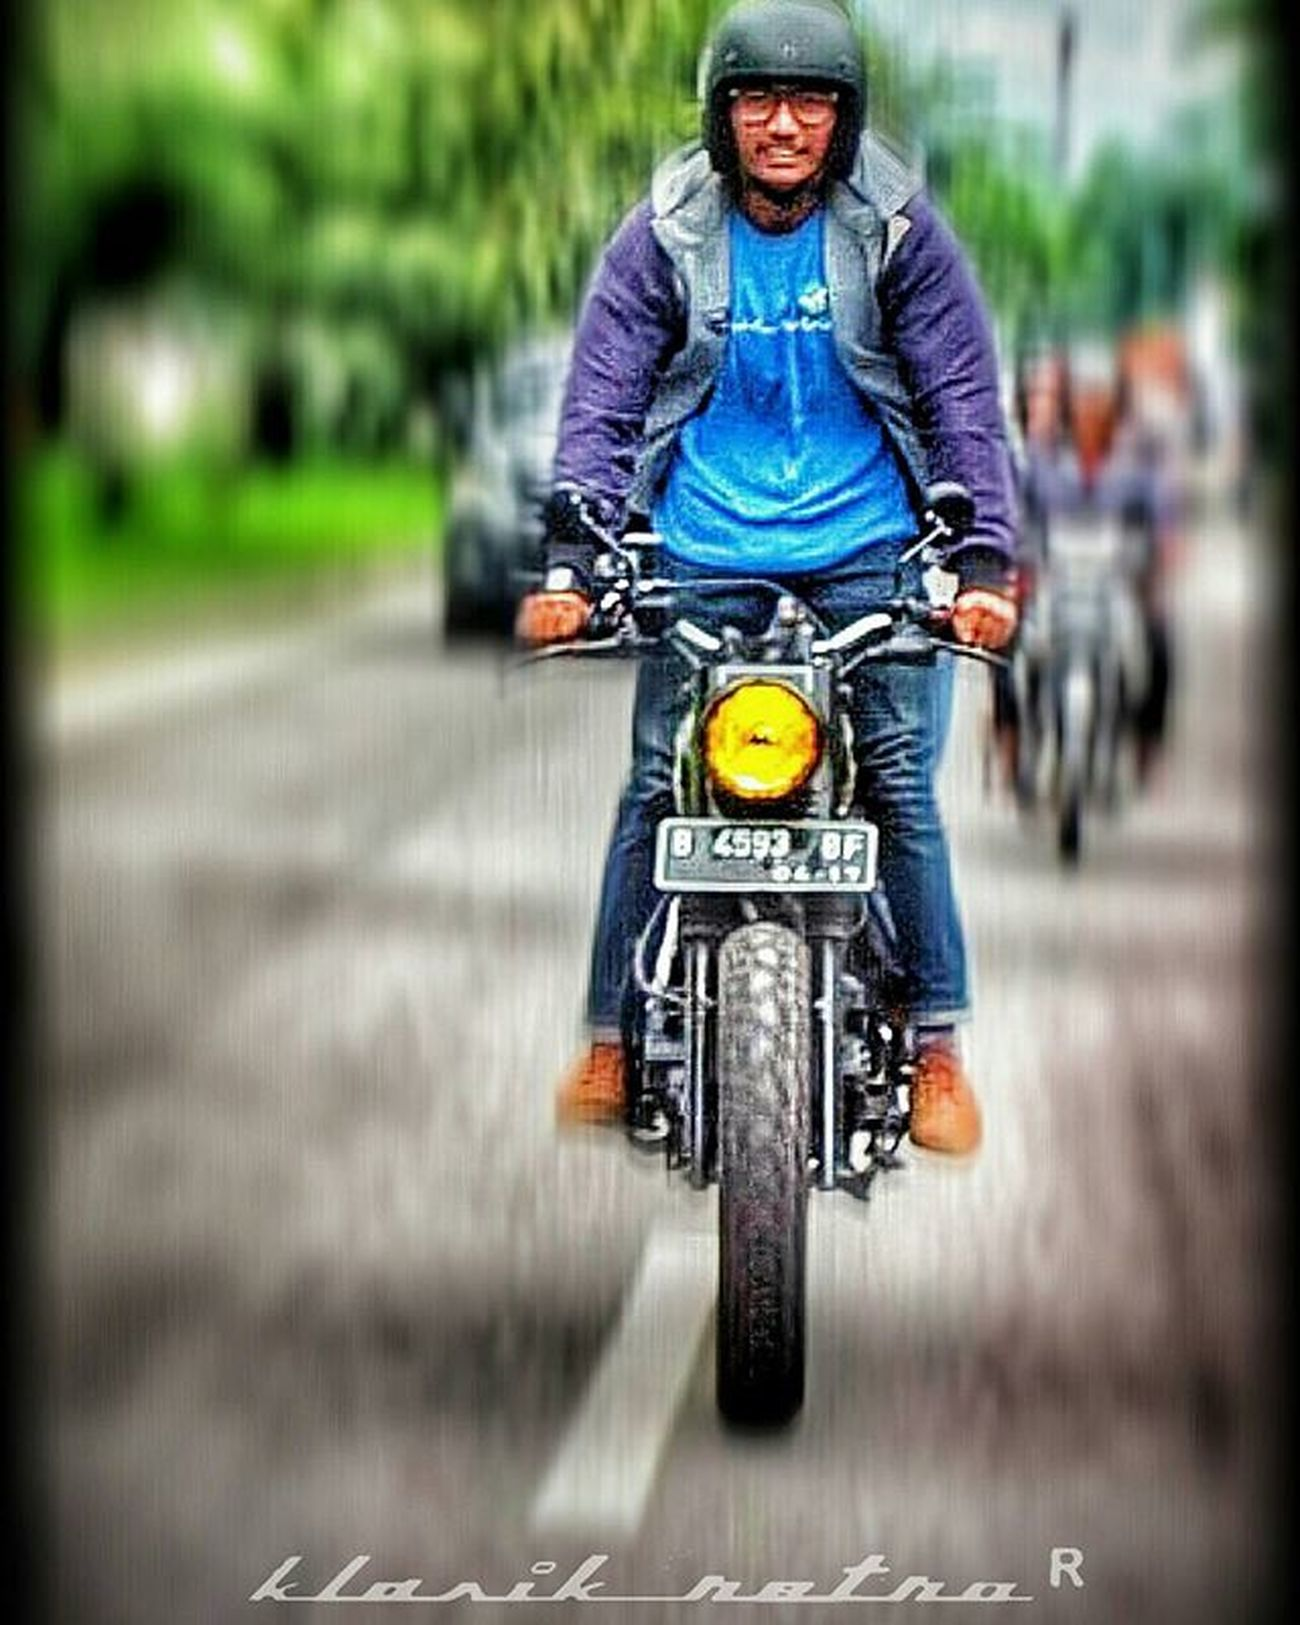 Freedommotorcycles Bastarddriver Bastardrider Klasikretrogoestobogor Scrambleryamaha MyLifeMyRules Bosennaekmobil Touring SundayMorningRide NakedBike Gassspoooolll